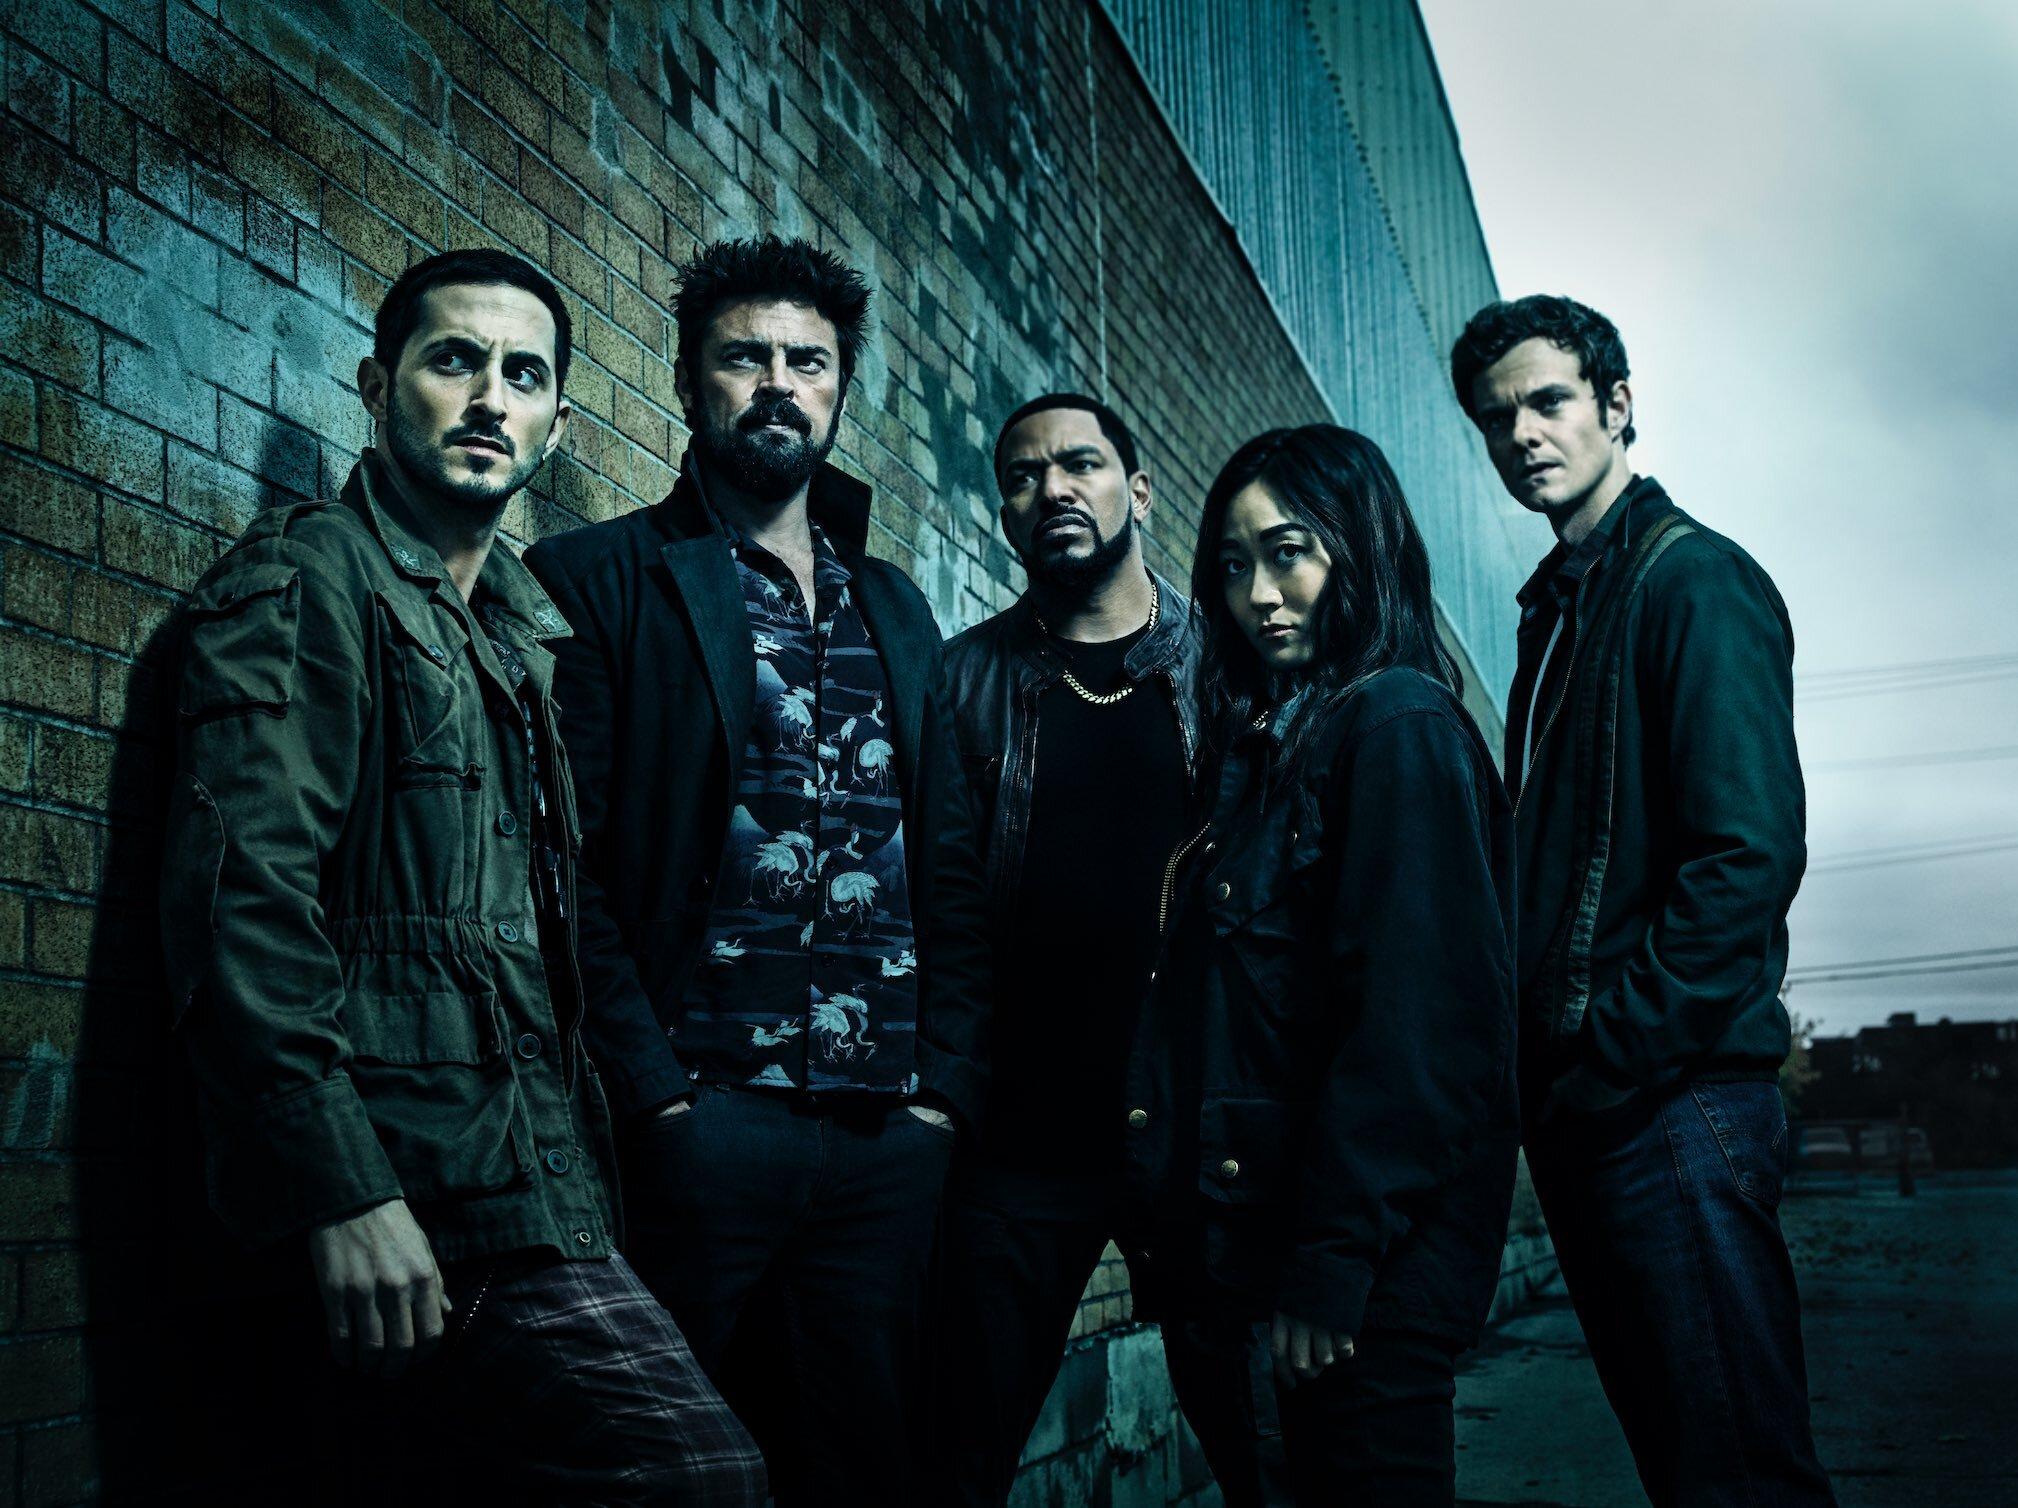 The cast of Amazon's 'The Boys'